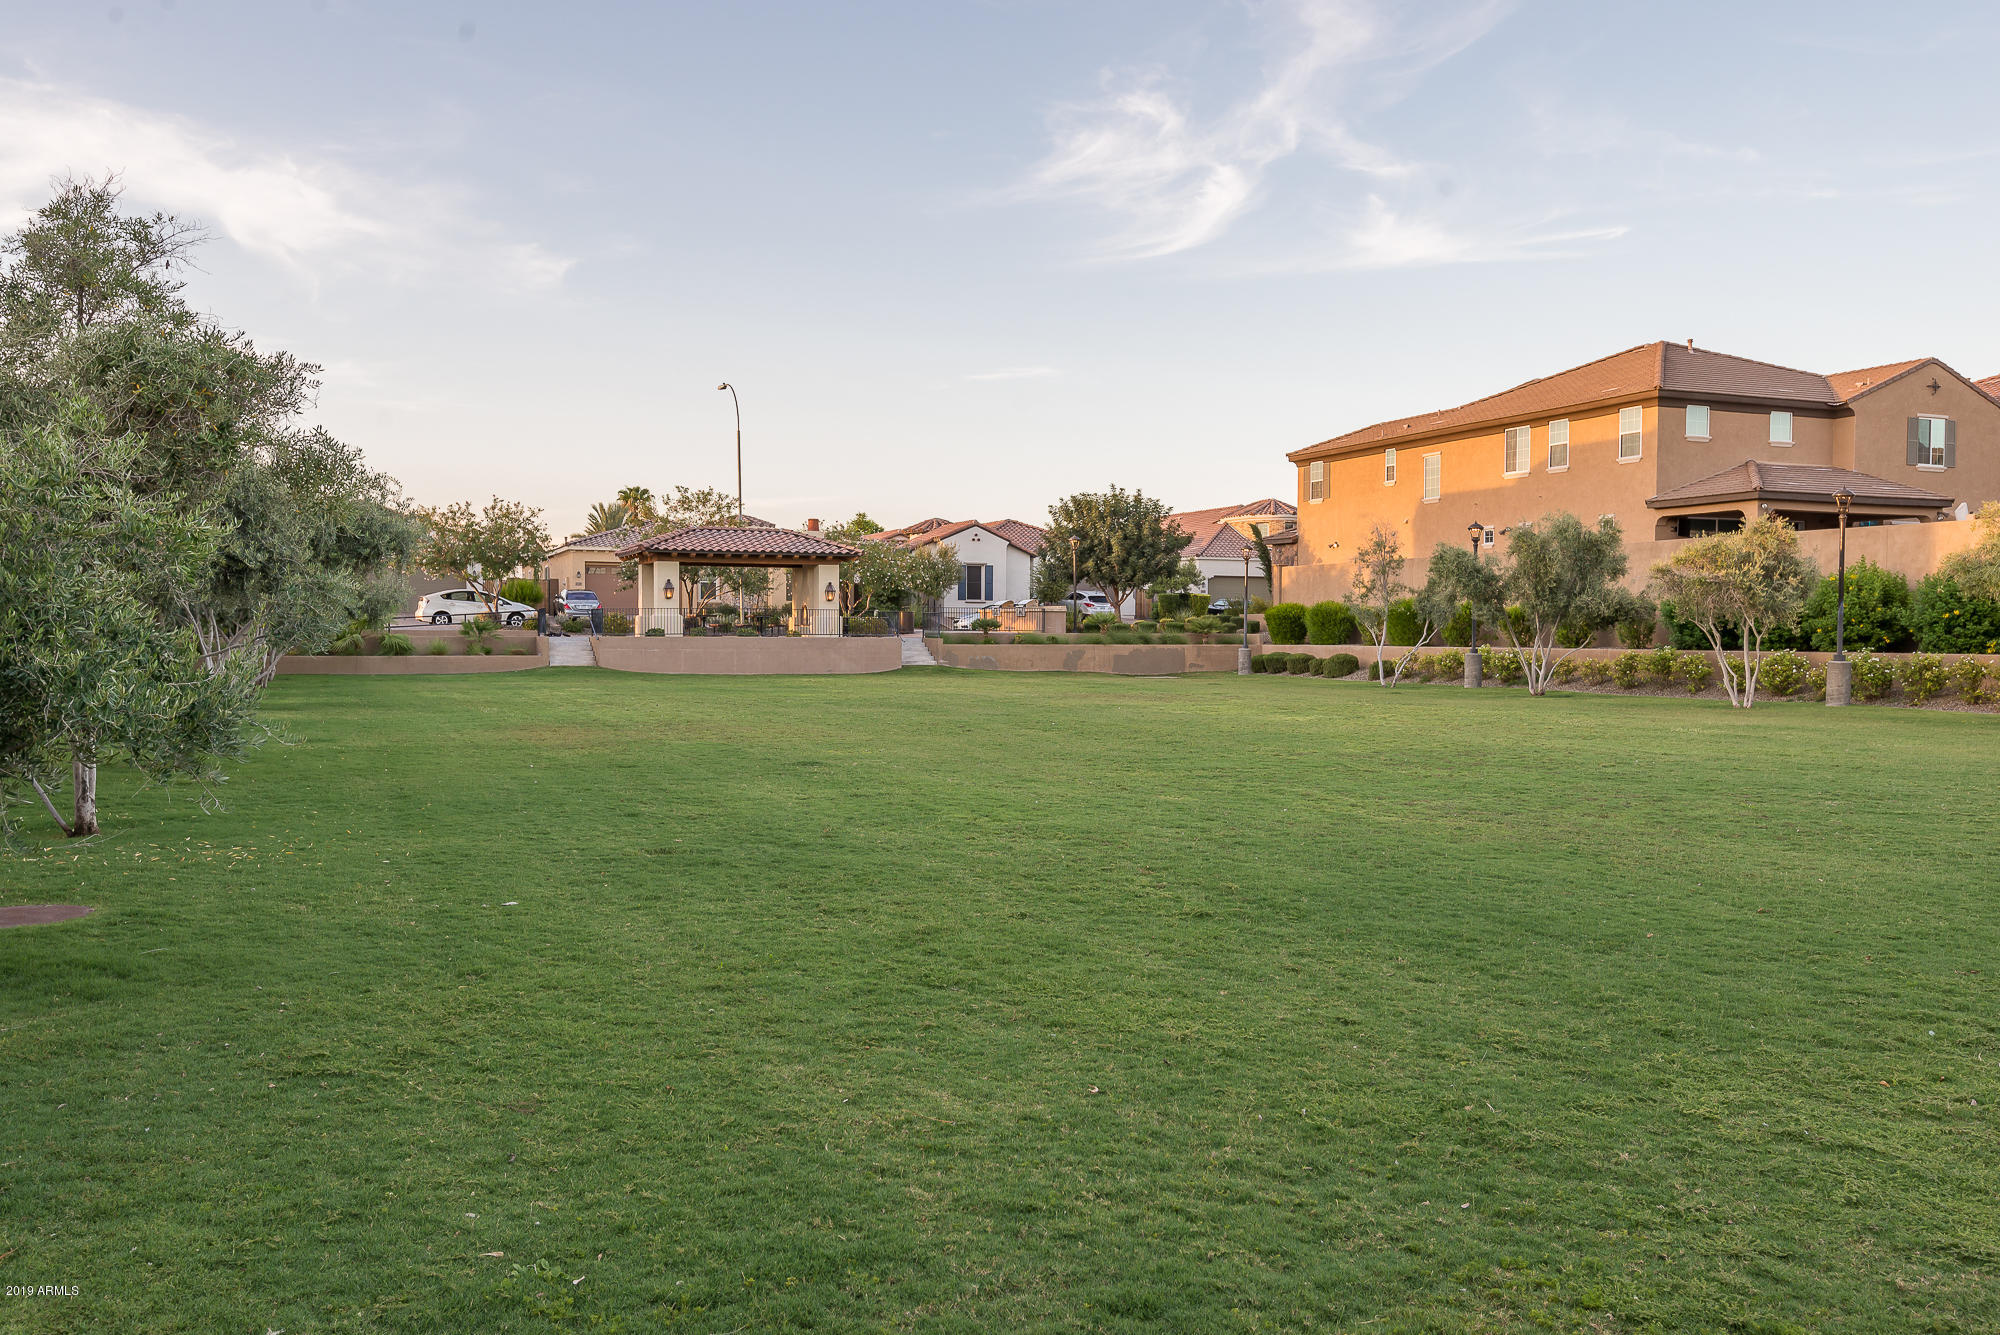 MLS 5867993 2171 E GERONIMO Street, Chandler, AZ 85225 Chandler AZ North Chandler